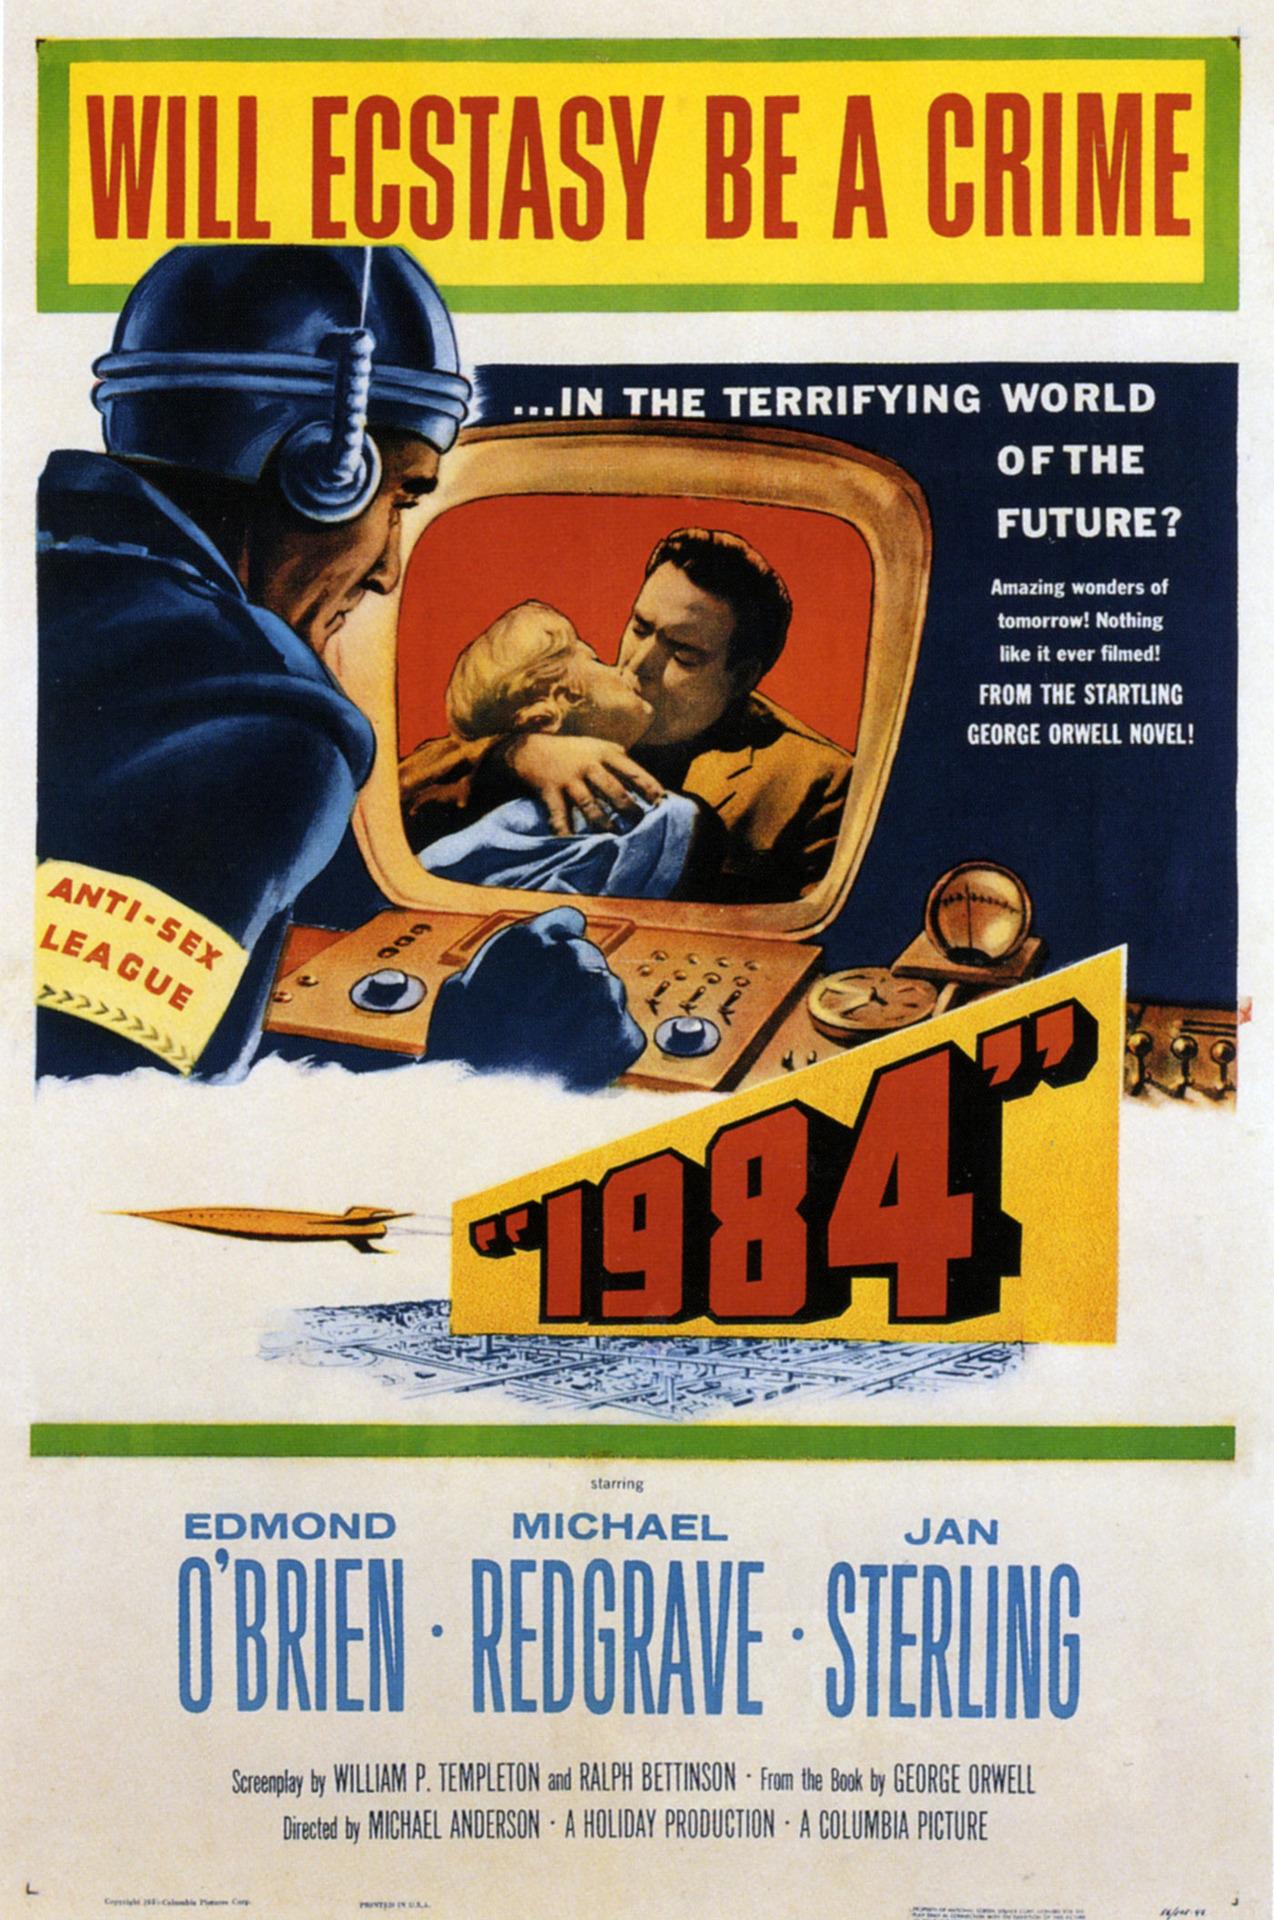 image 1984 Watch Full Movie Free Online